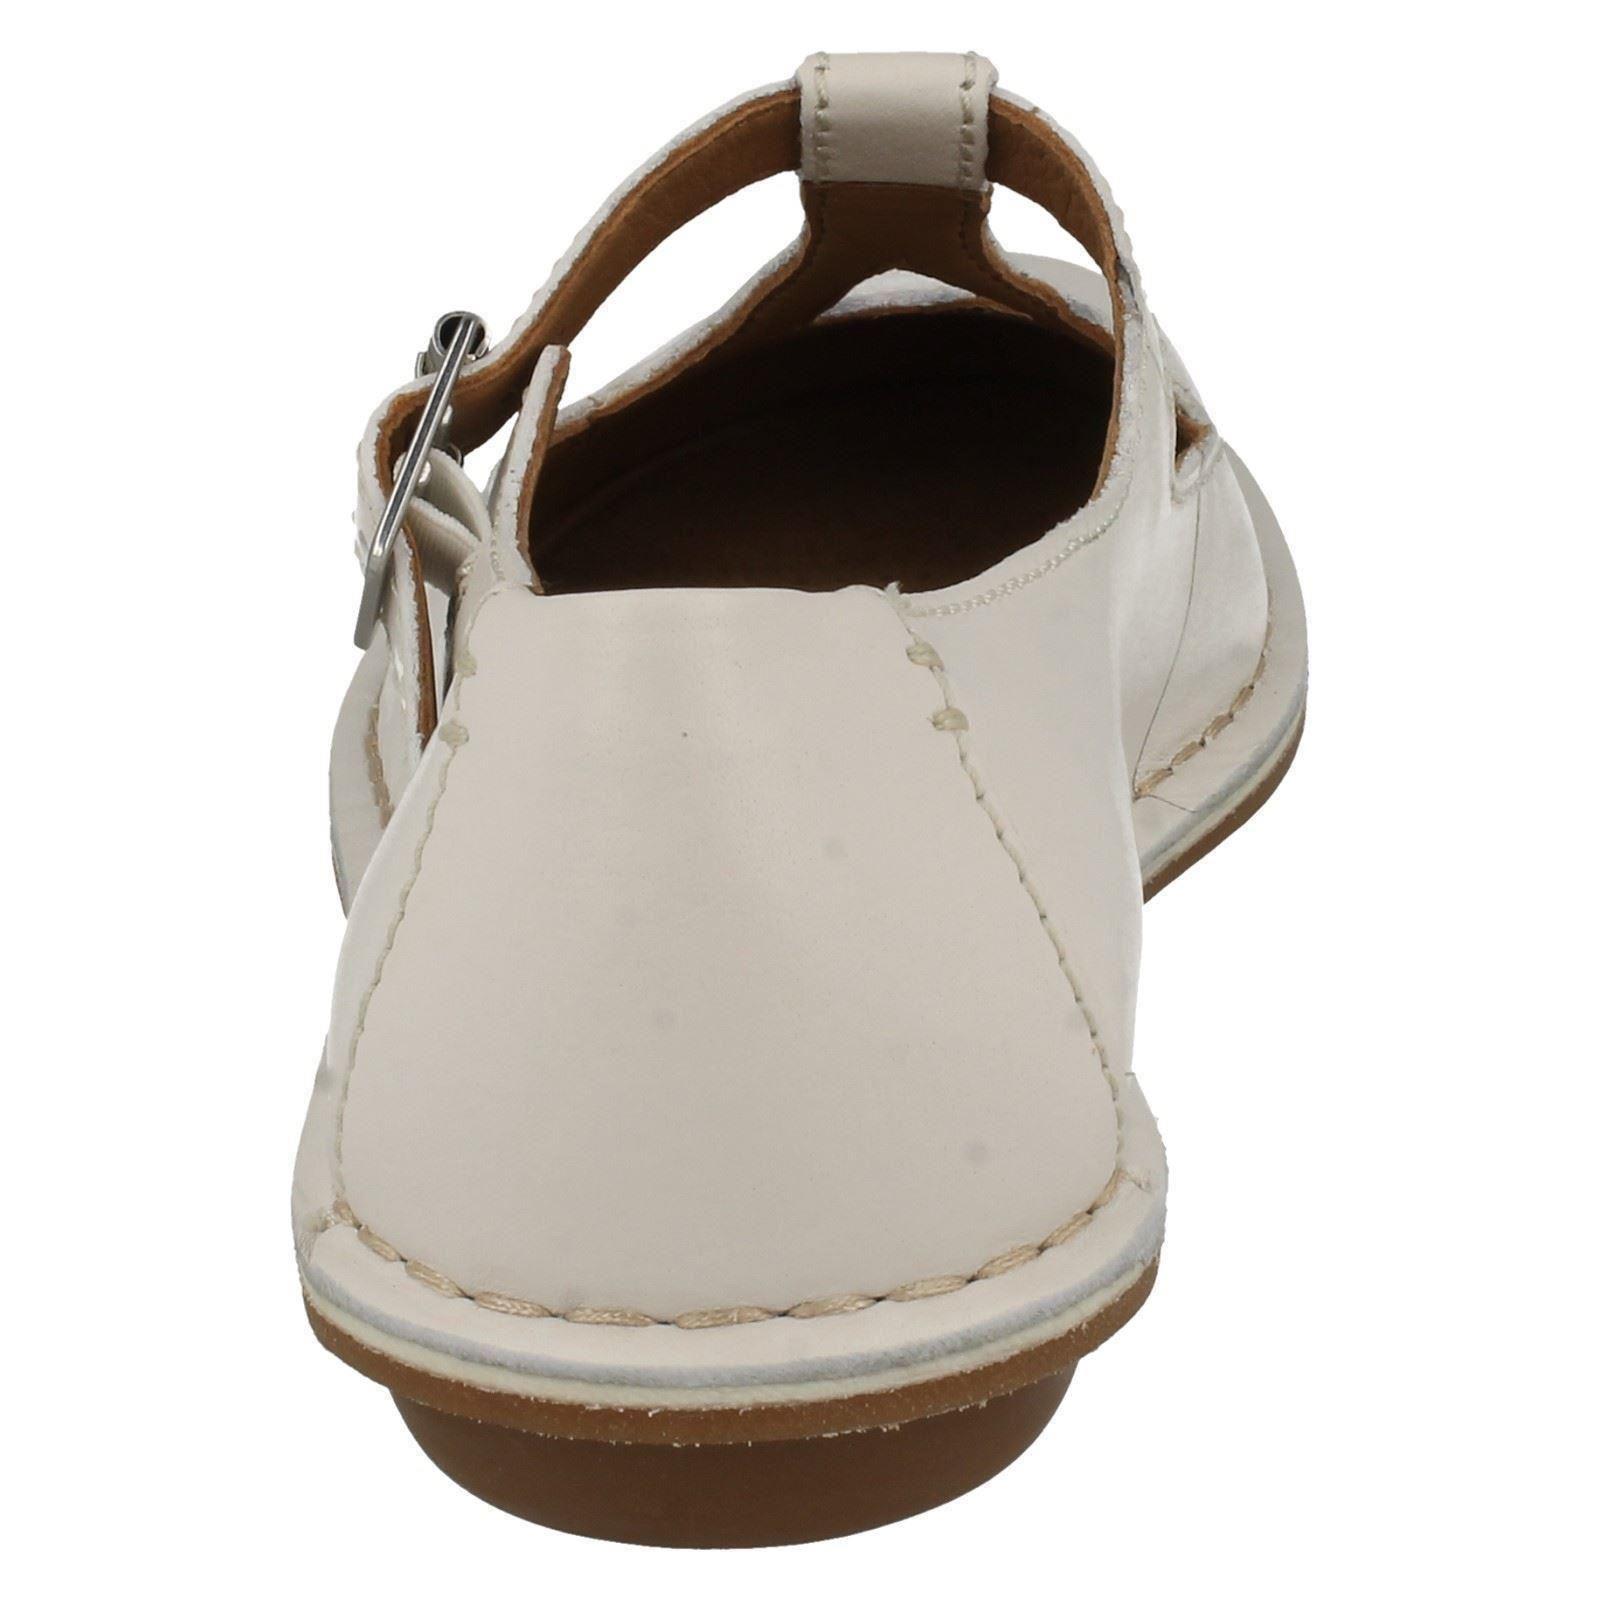 6c444507a Ladies-Clarks-T-Bar-Flat-Shoes-Tustin-Talent thumbnail